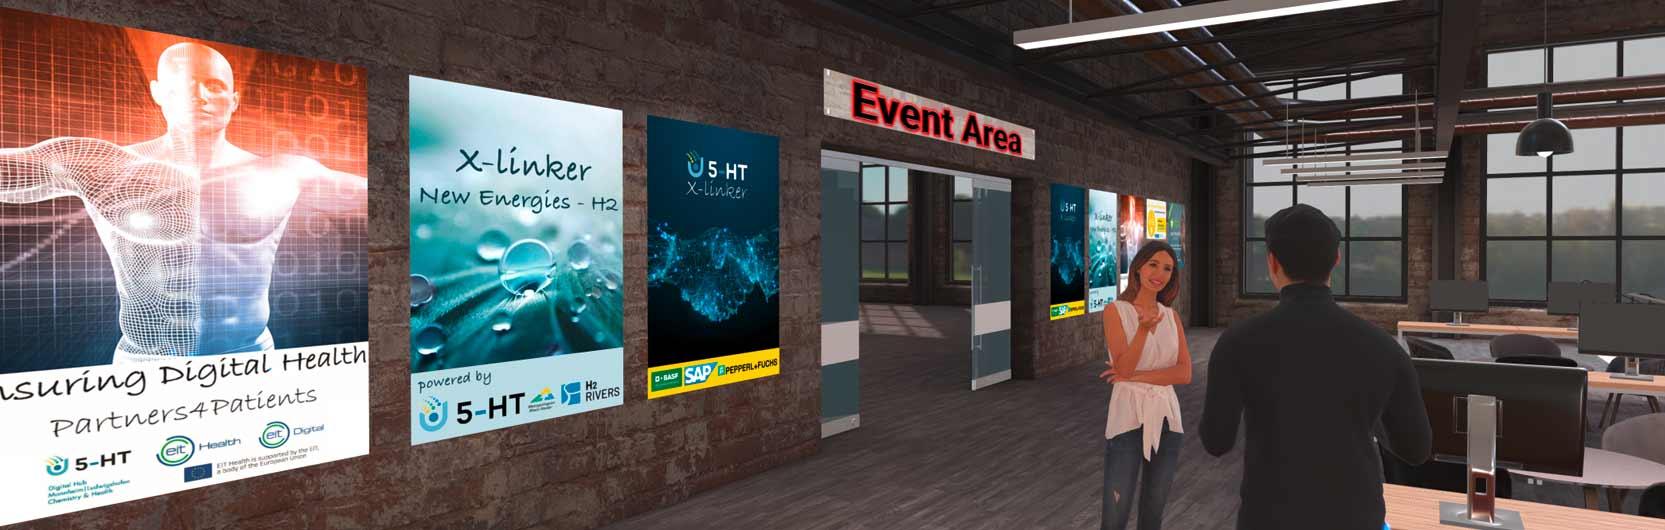 Unsere Programme | 5-HT Digital Hub Chemistry & Health